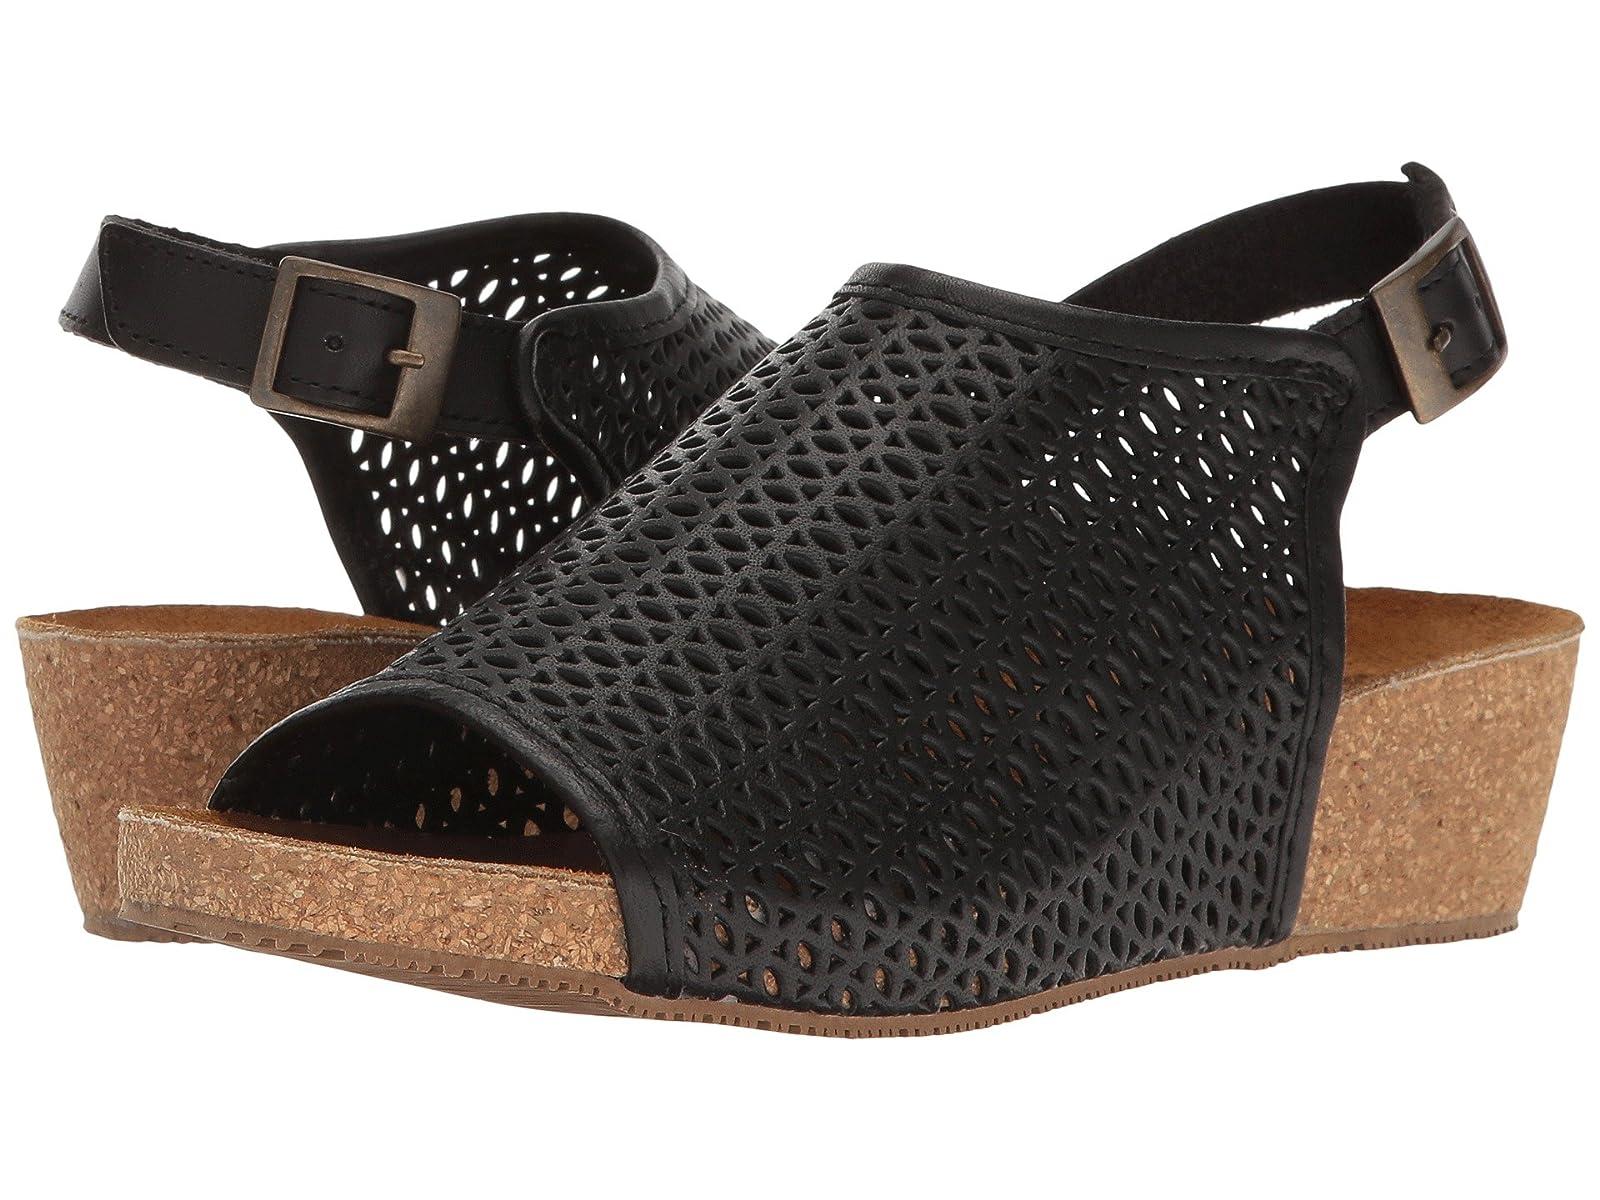 Eric Michael PhoebeAtmospheric grades have affordable shoes